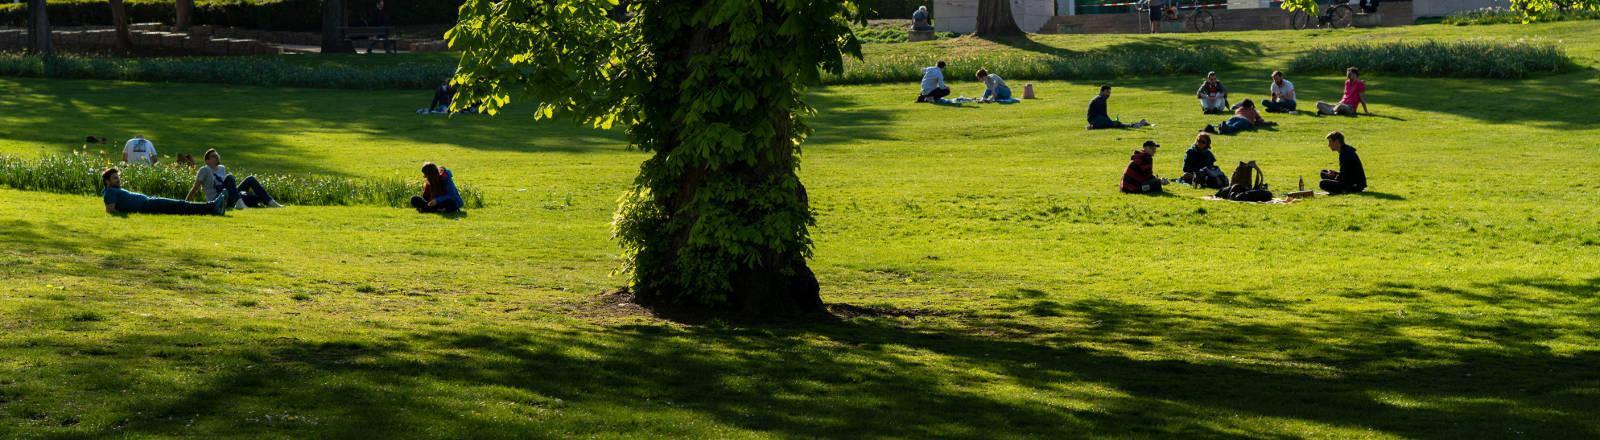 Stadtpark mit Baum